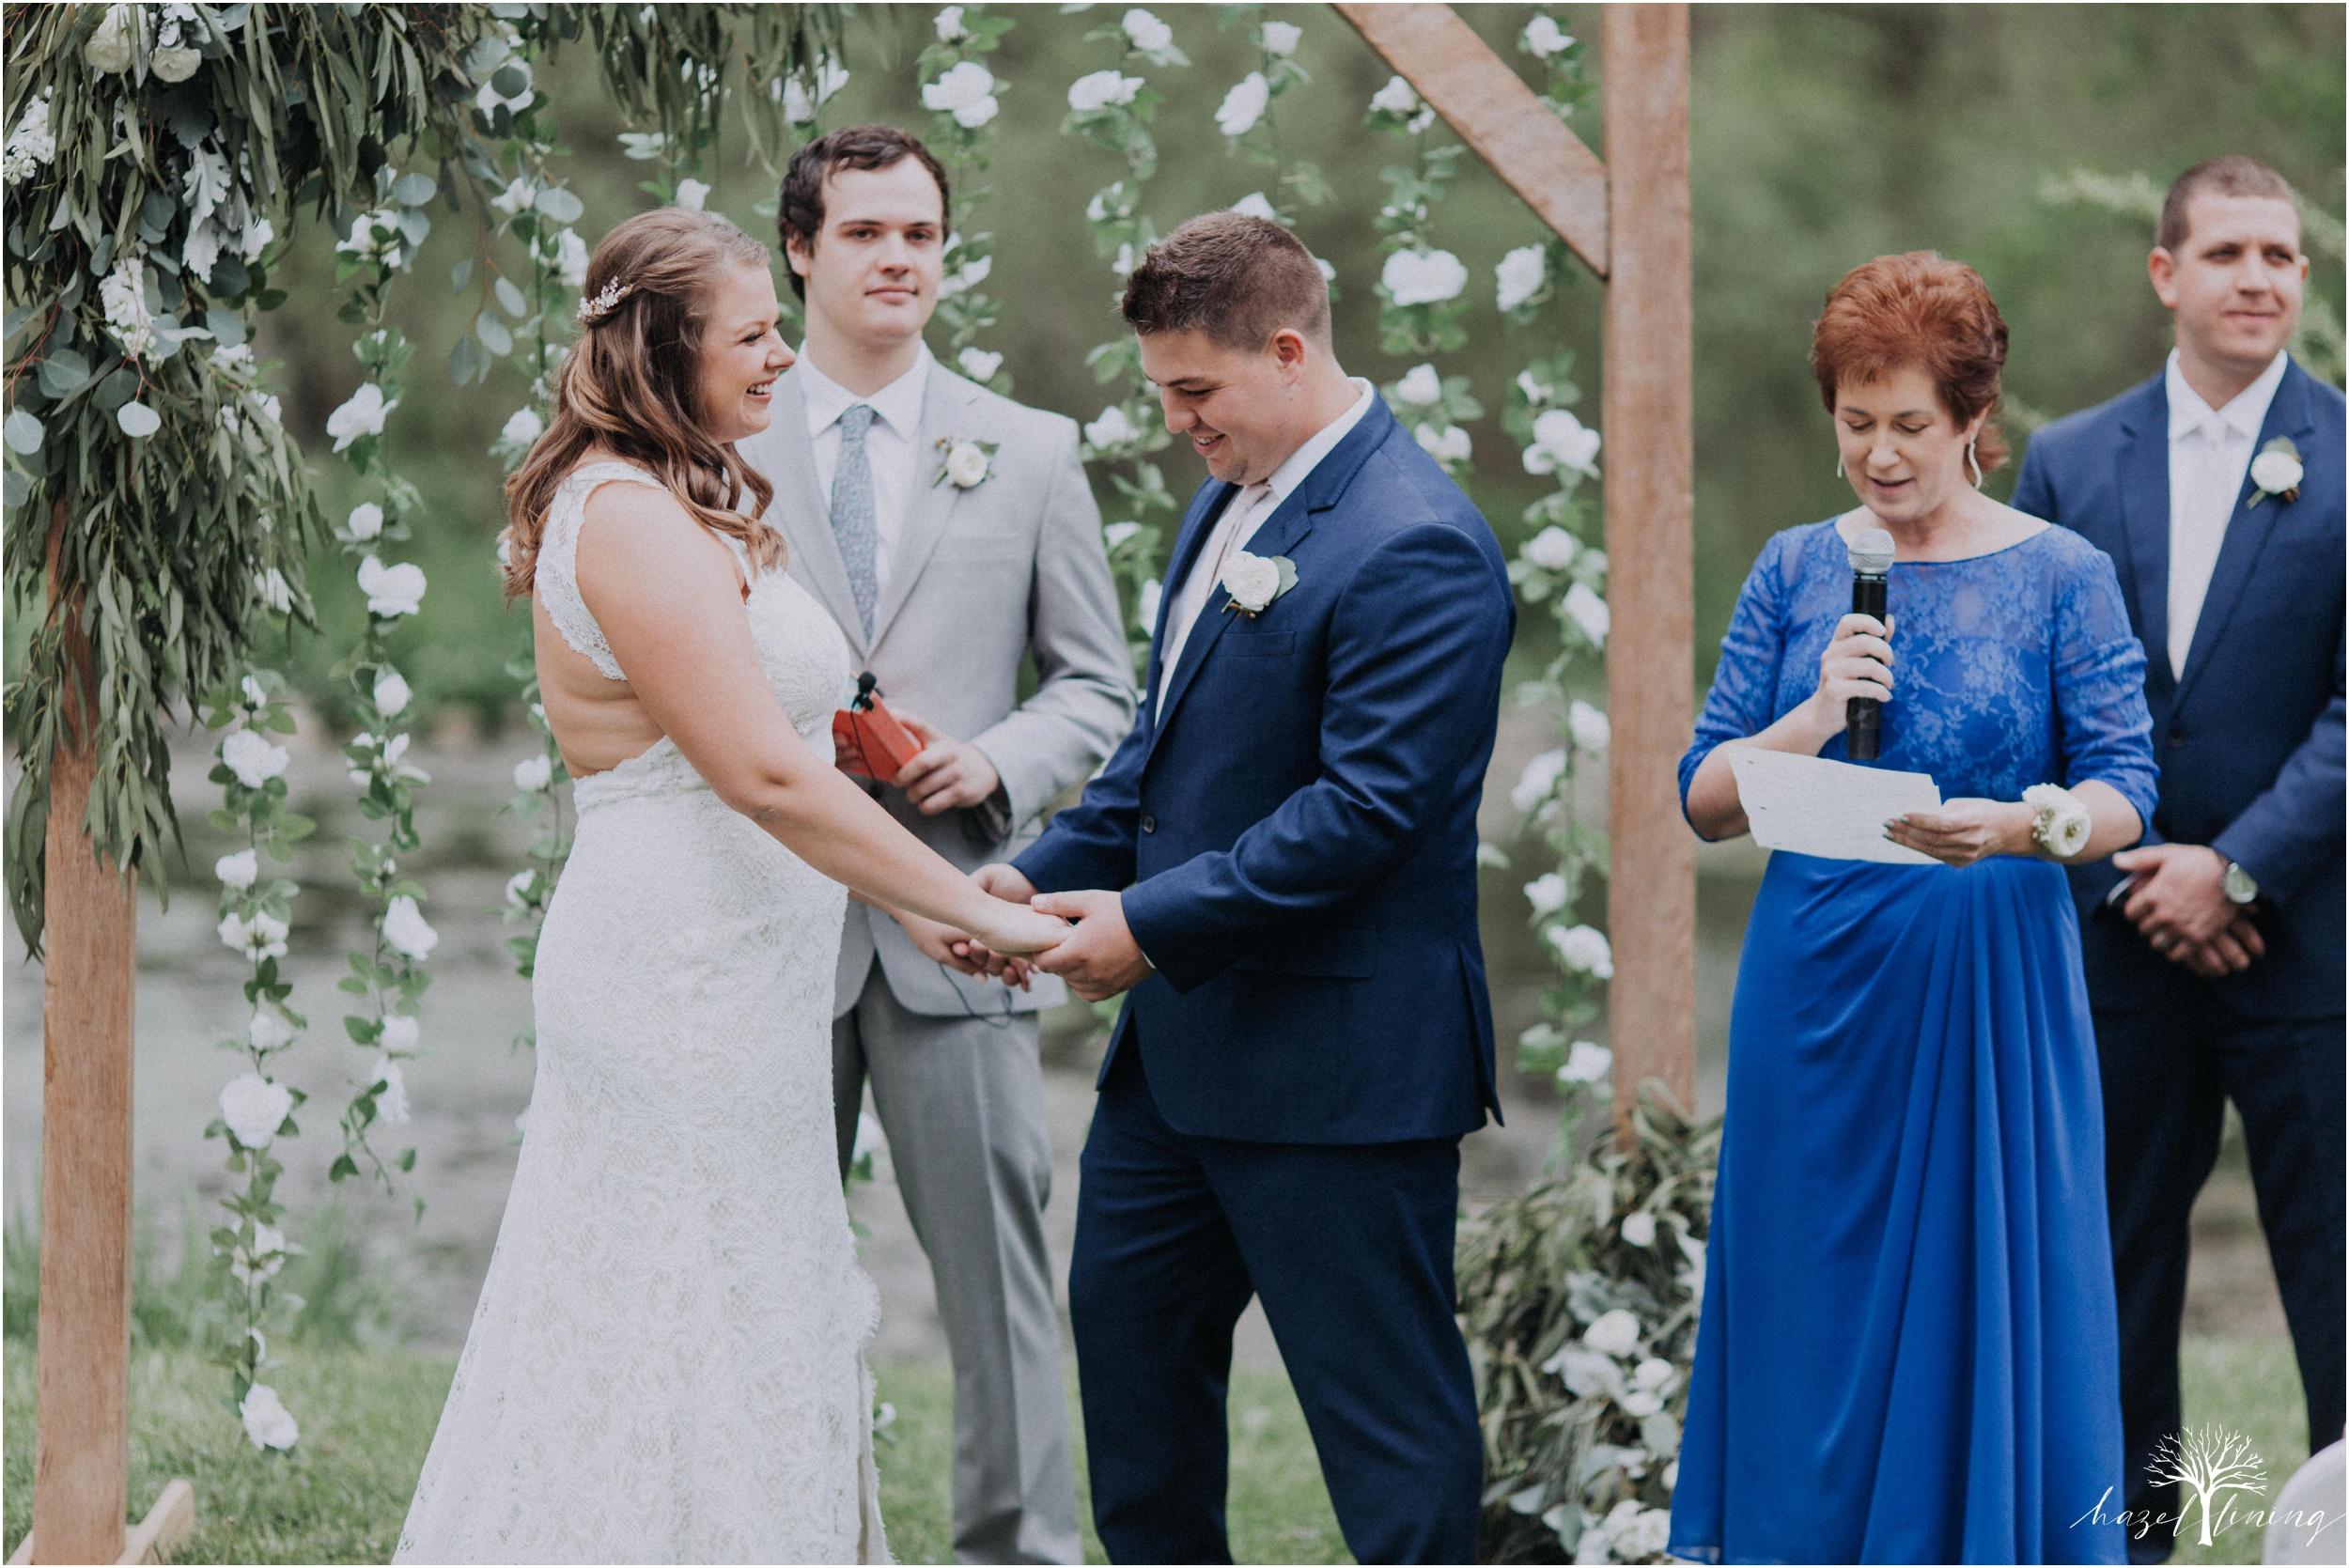 hazel-lining-travel-wedding-elopement-photography-abby-skyler-hunt-the-willis-house-york-pennsylvania-outdoor-estate-wedding_0088.jpg